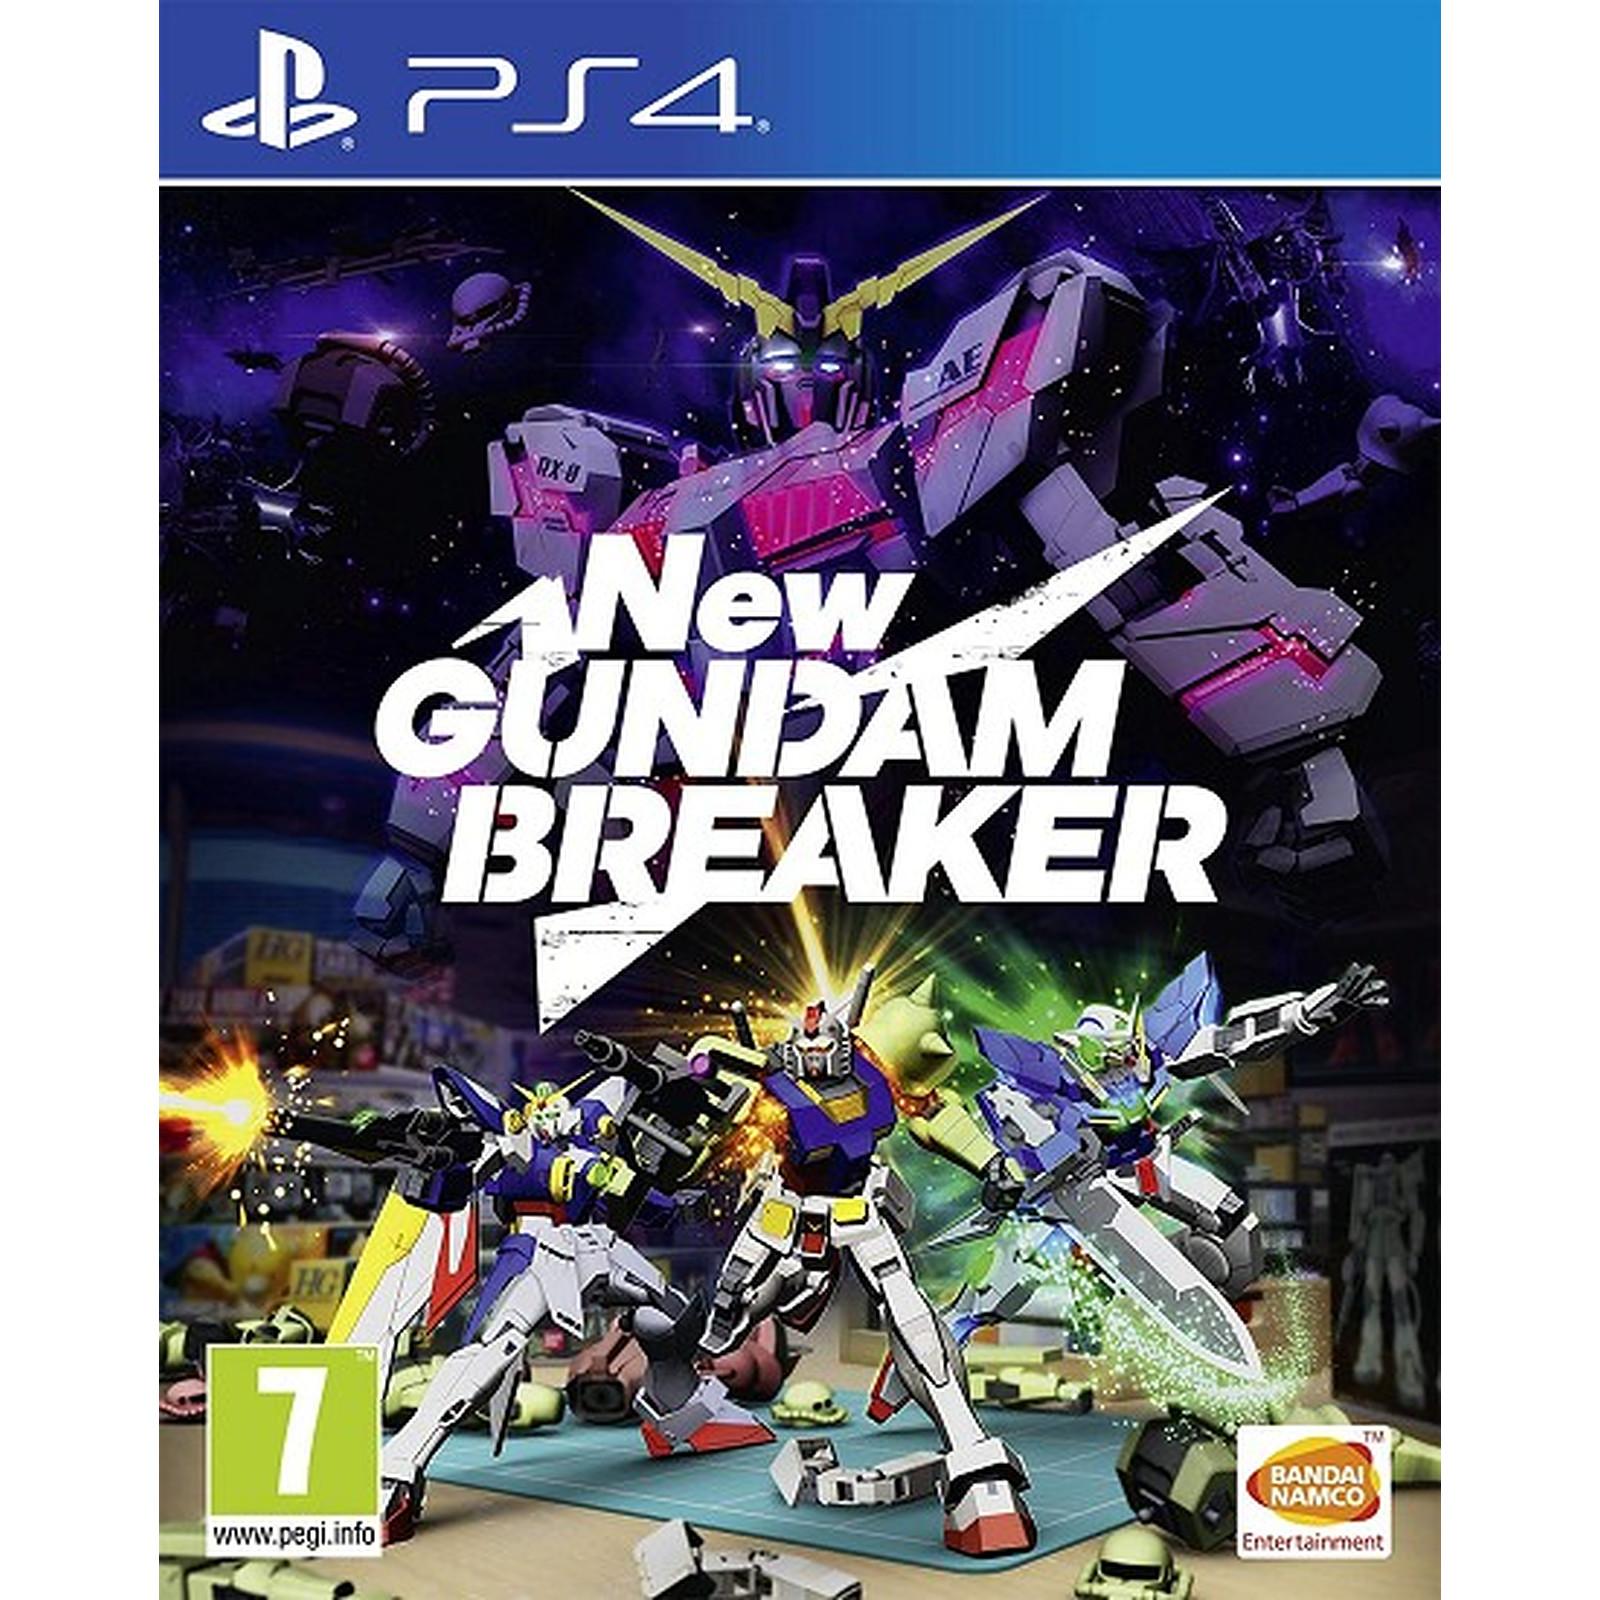 New Gundam Breaker (PS4)